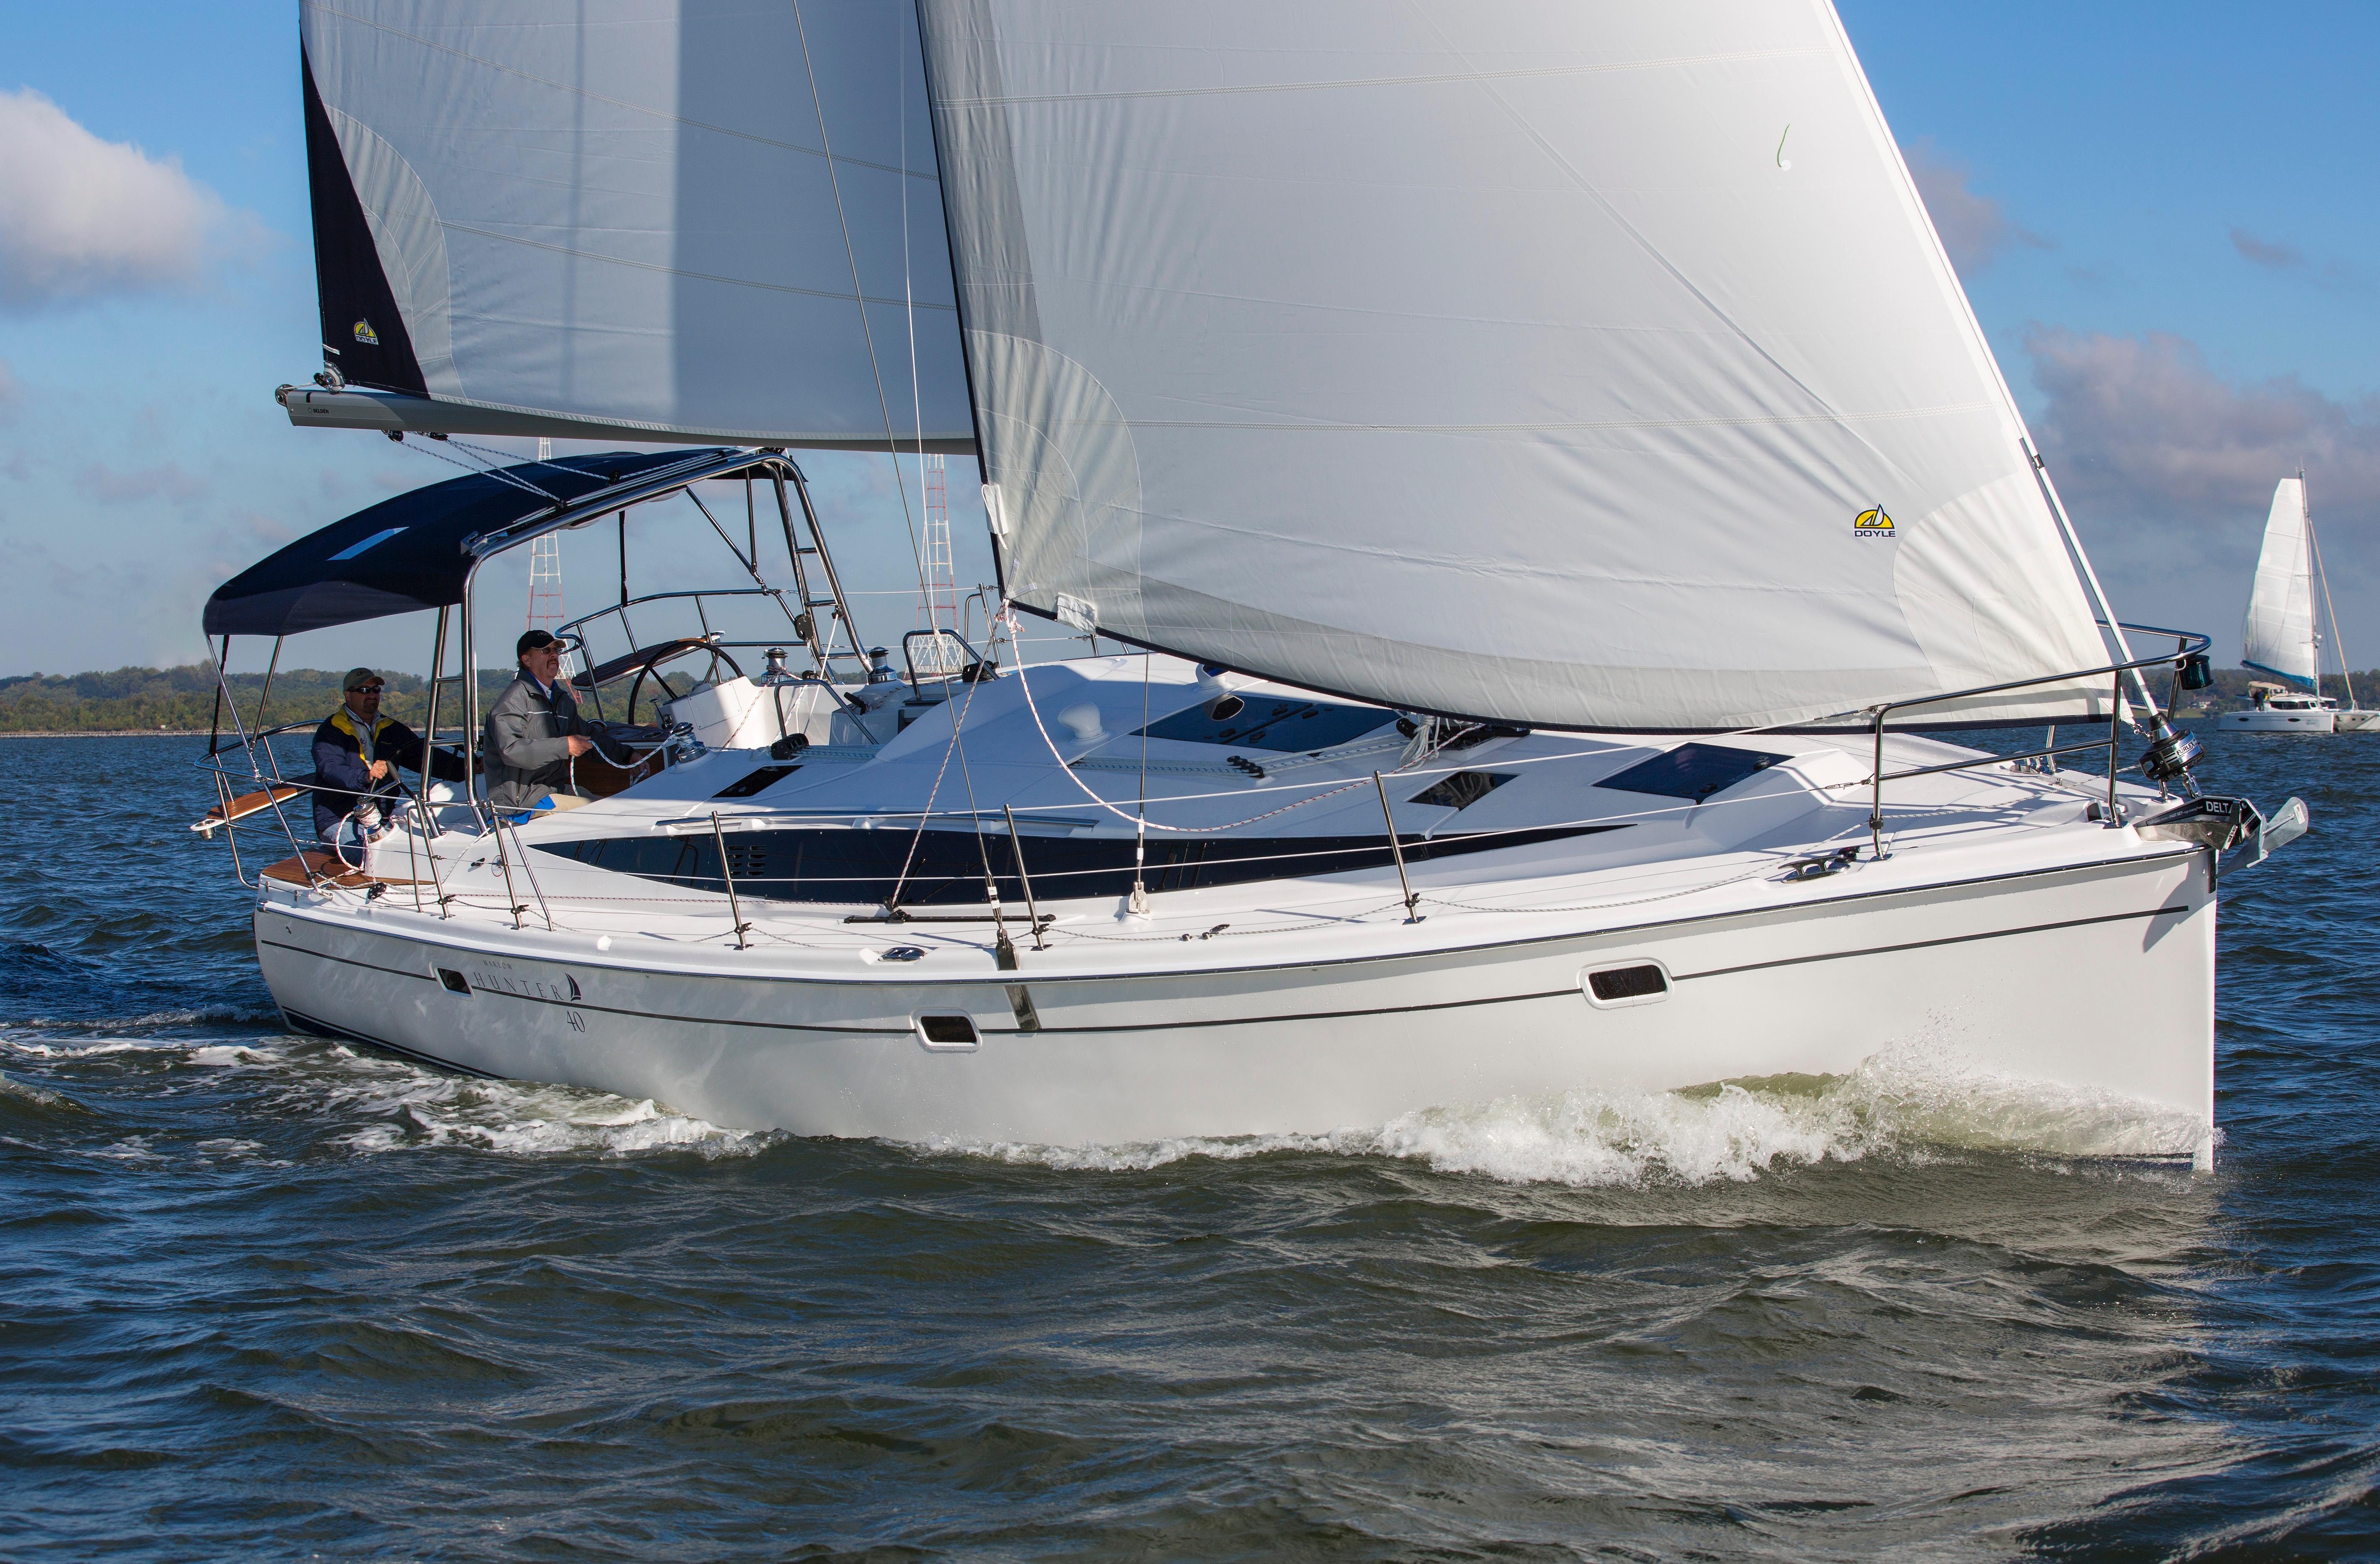 Boats for Sale - Norton Yachts - Deltaville, VA